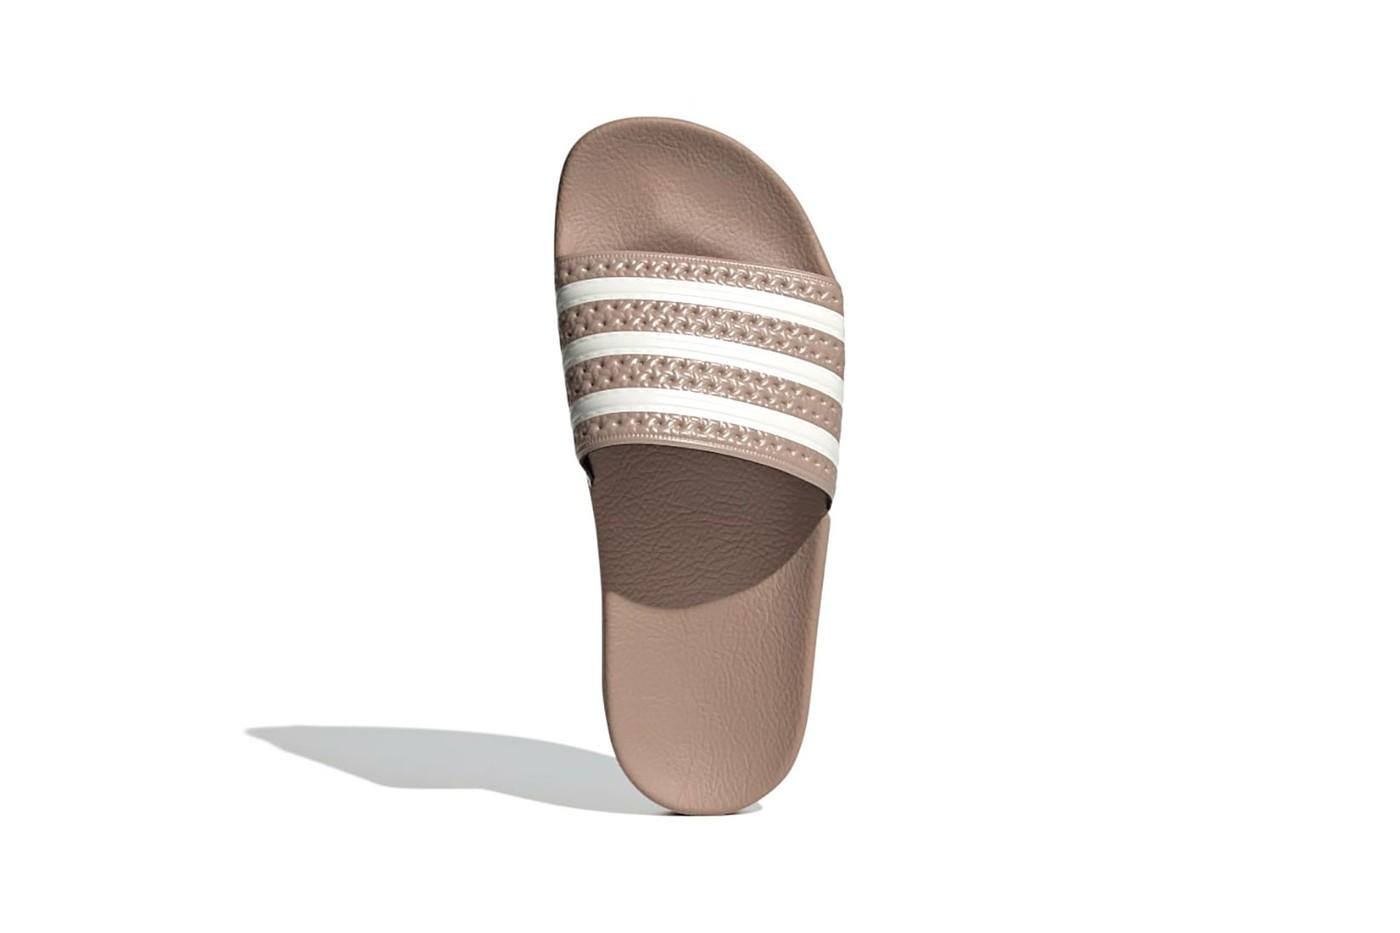 Adidas adilette w slides sandals womens nude brown beige colorway